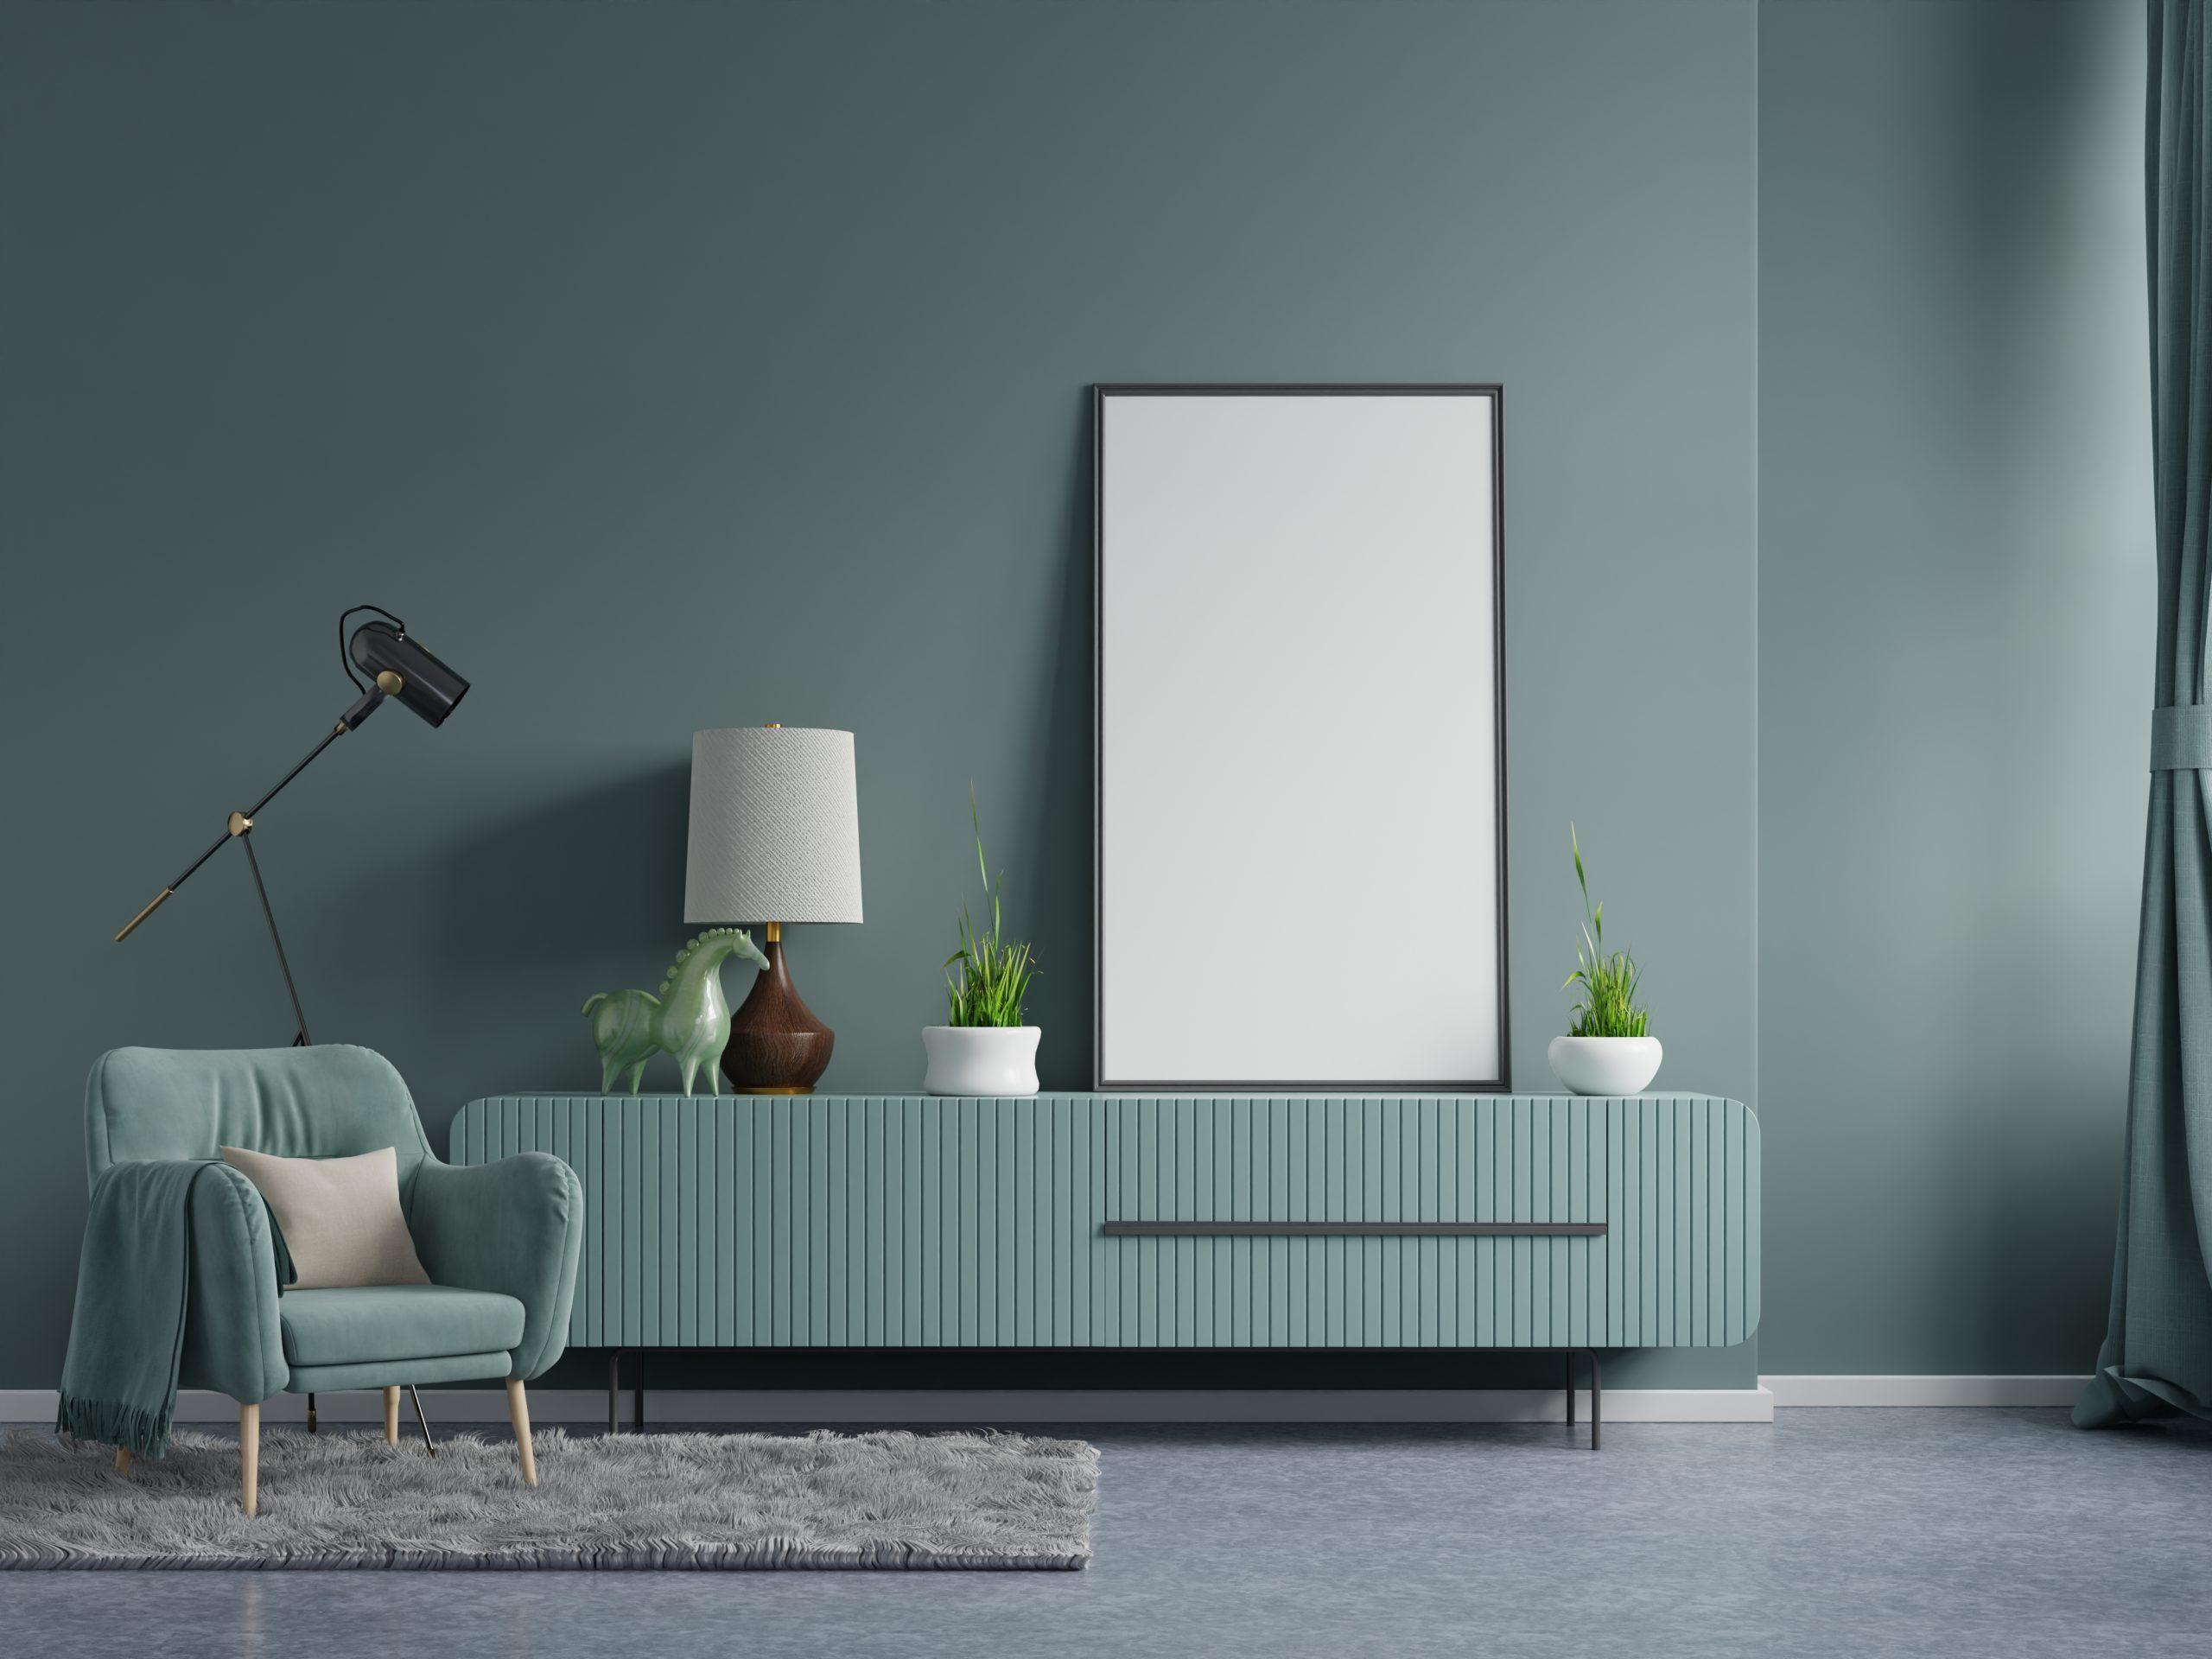 Poster mockup with vertical frames on empty dark green wall in living room interior with dark green velvet armchair.3D rendering